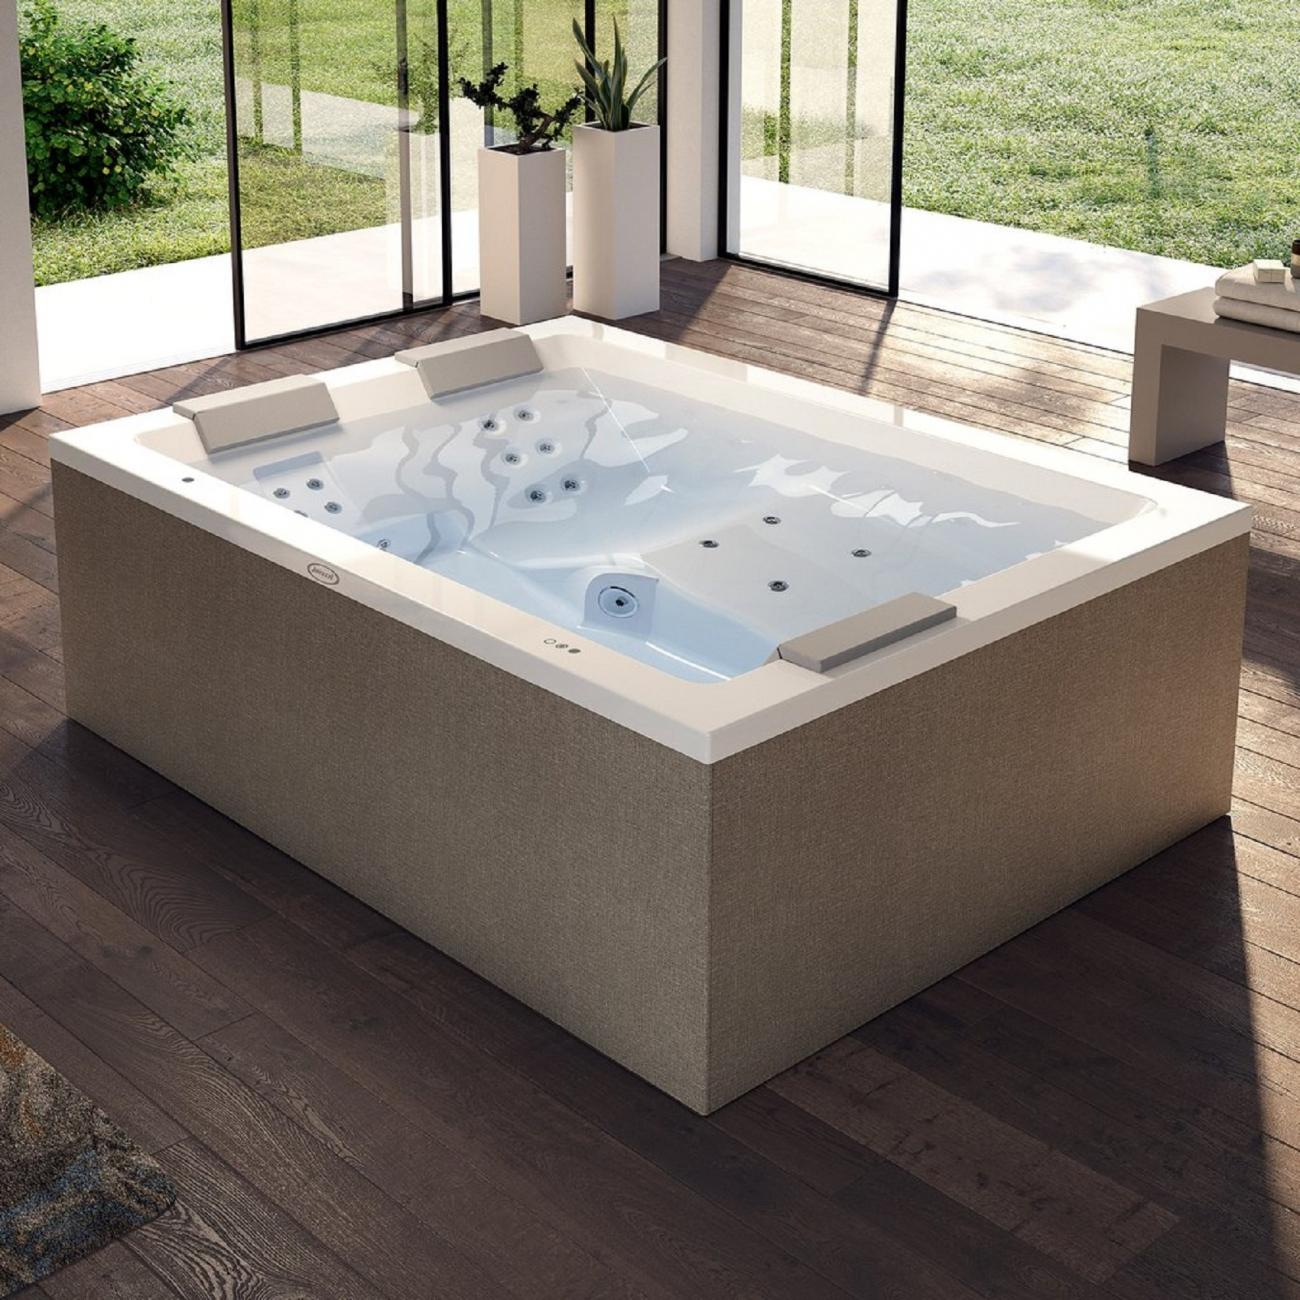 Jacuzzi Whirlpool Jacuzzi.Jacuzzi Sharp Extra Whirlpool Bath Tattahome